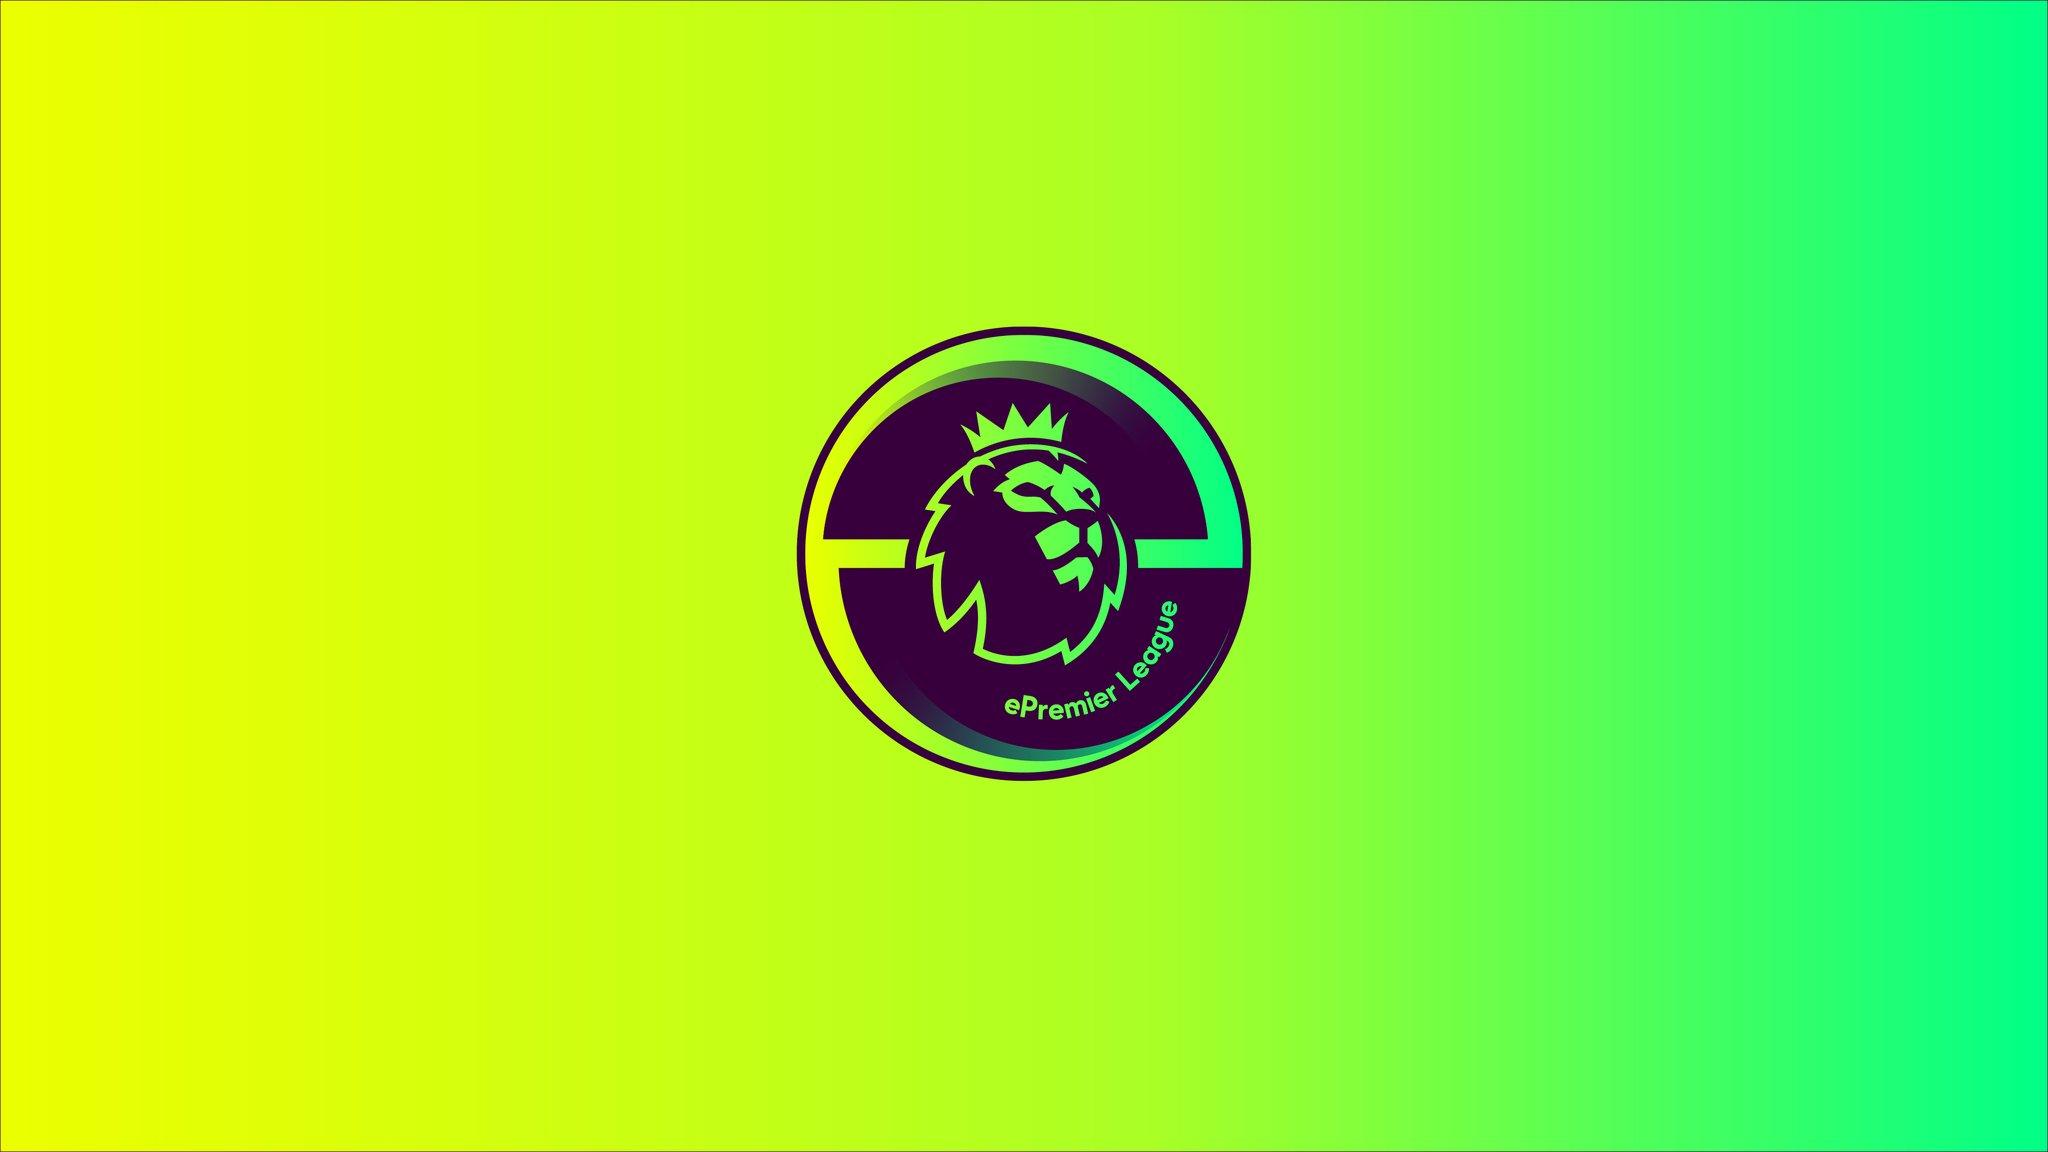 La Premier League de Inglaterra se sube a los eSports